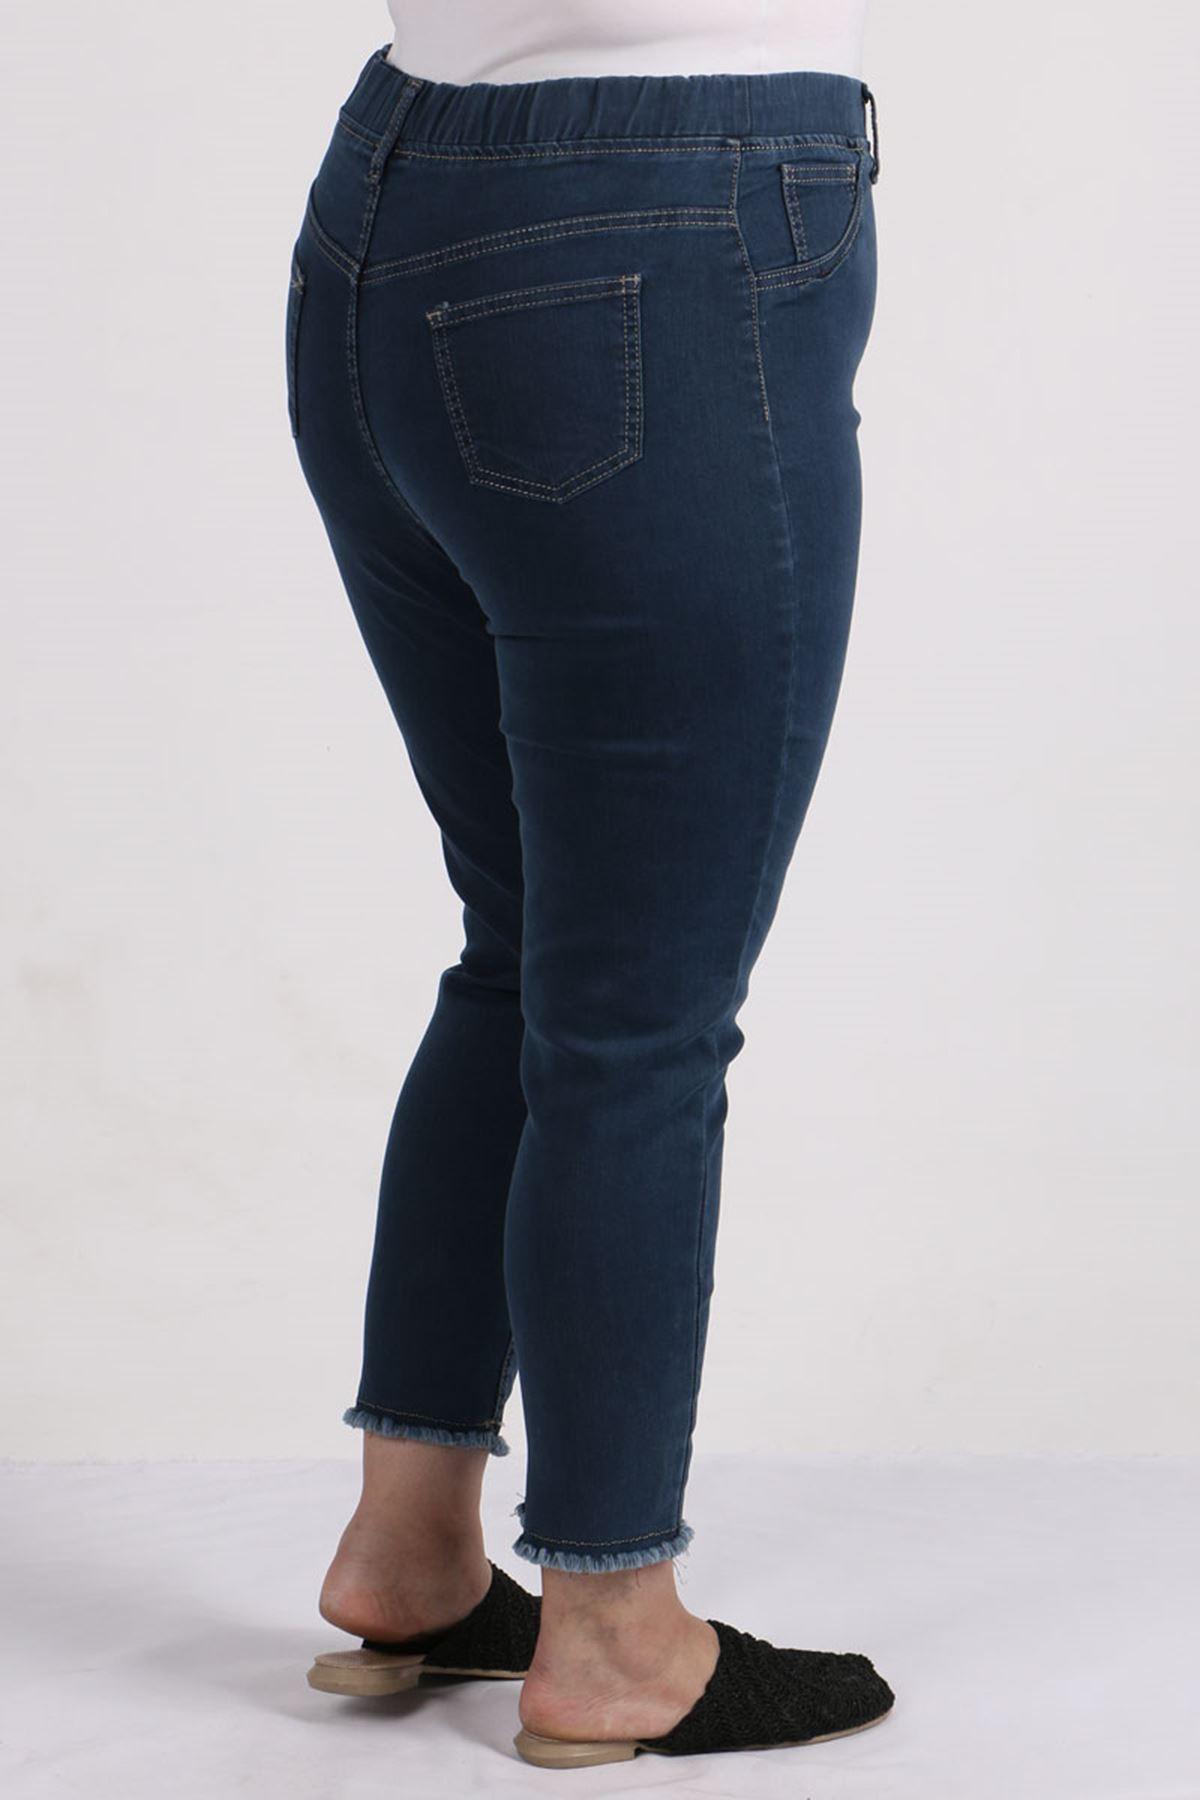 9138 Plus Size Elastic Waist Skinny Leg Jeans - Dark Blue